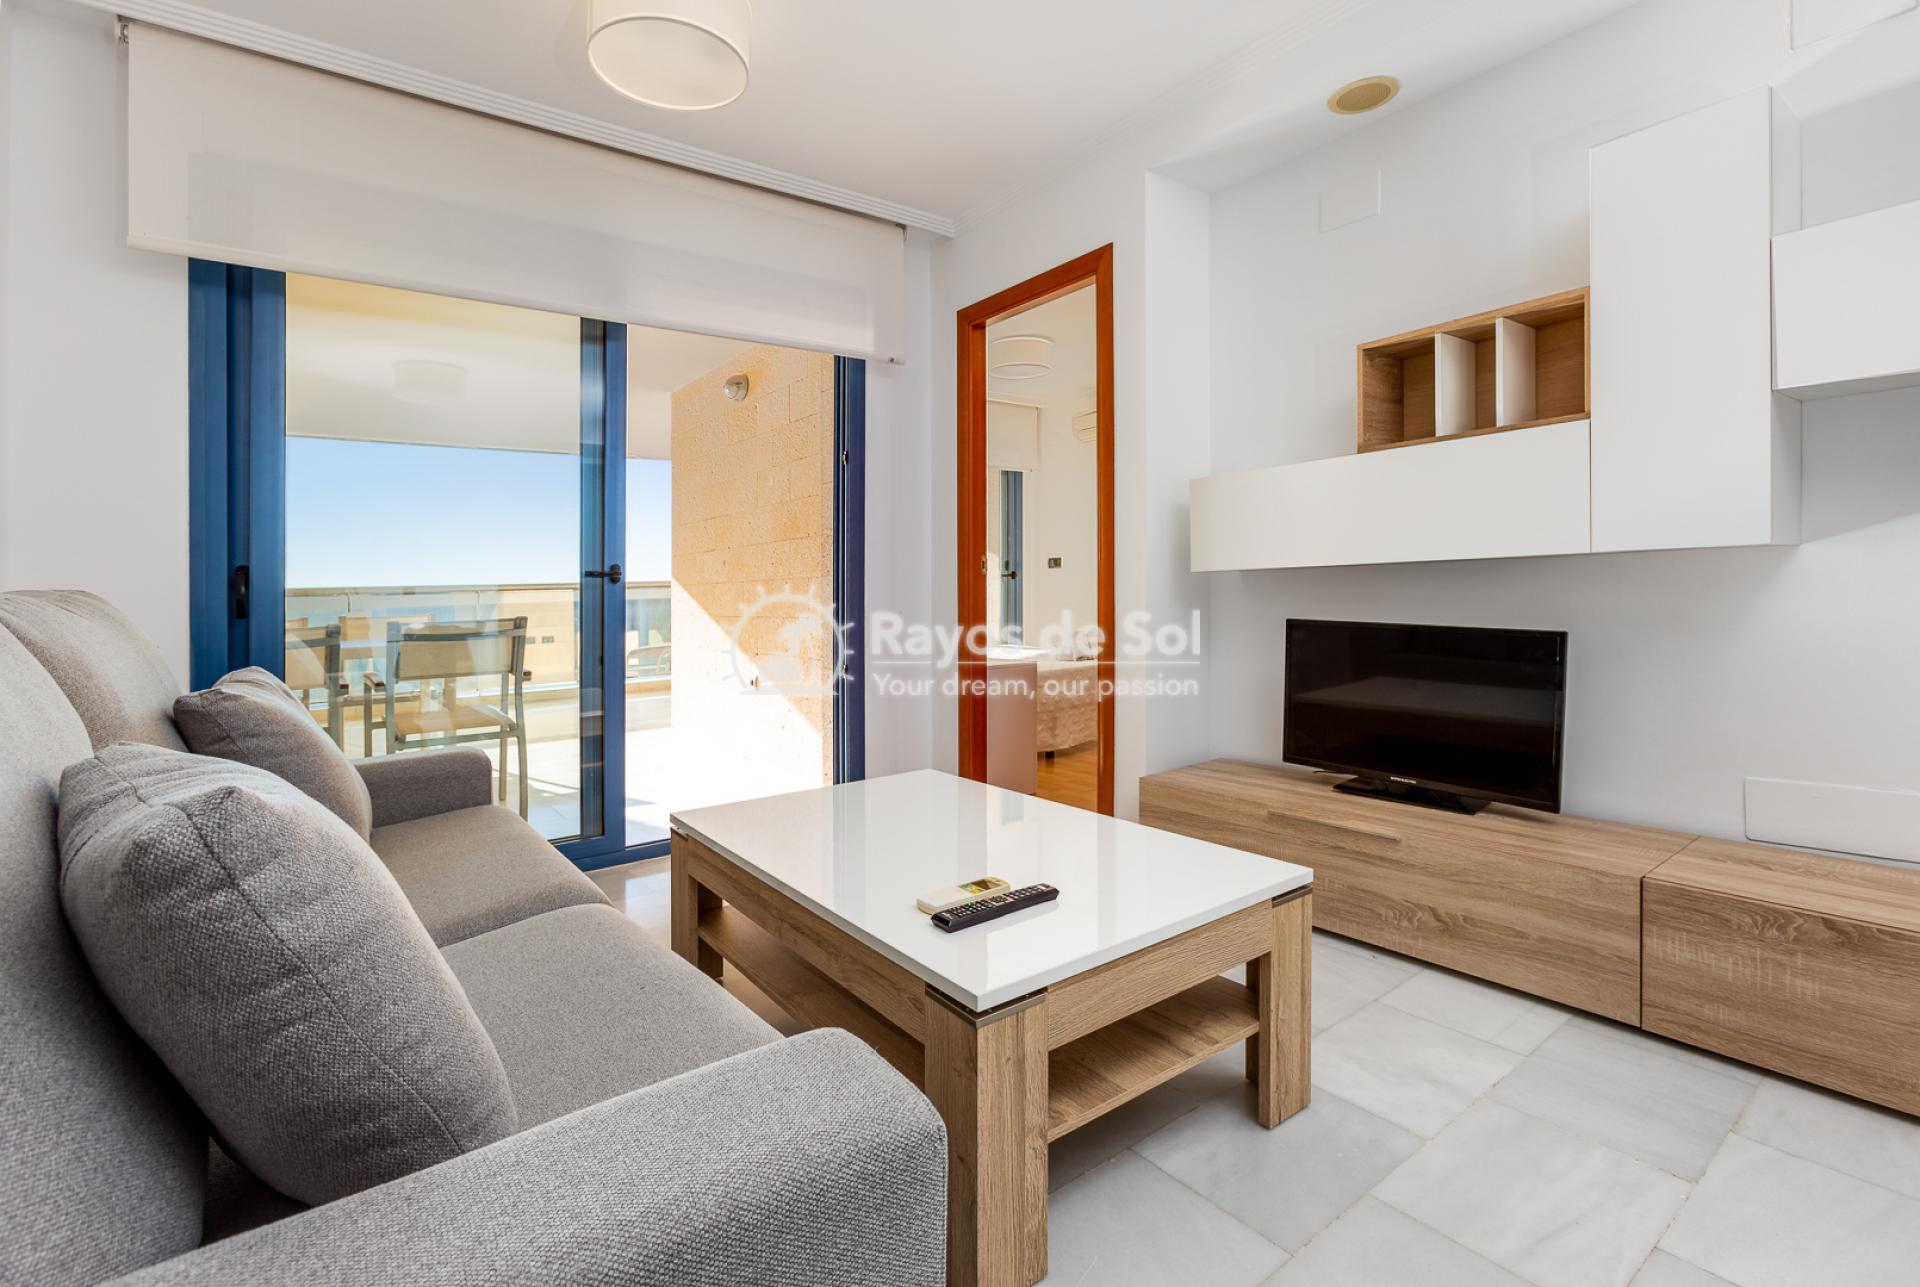 Turnekey first line apartments  in Altea, Costa Blanca (Alteabeach) - 12